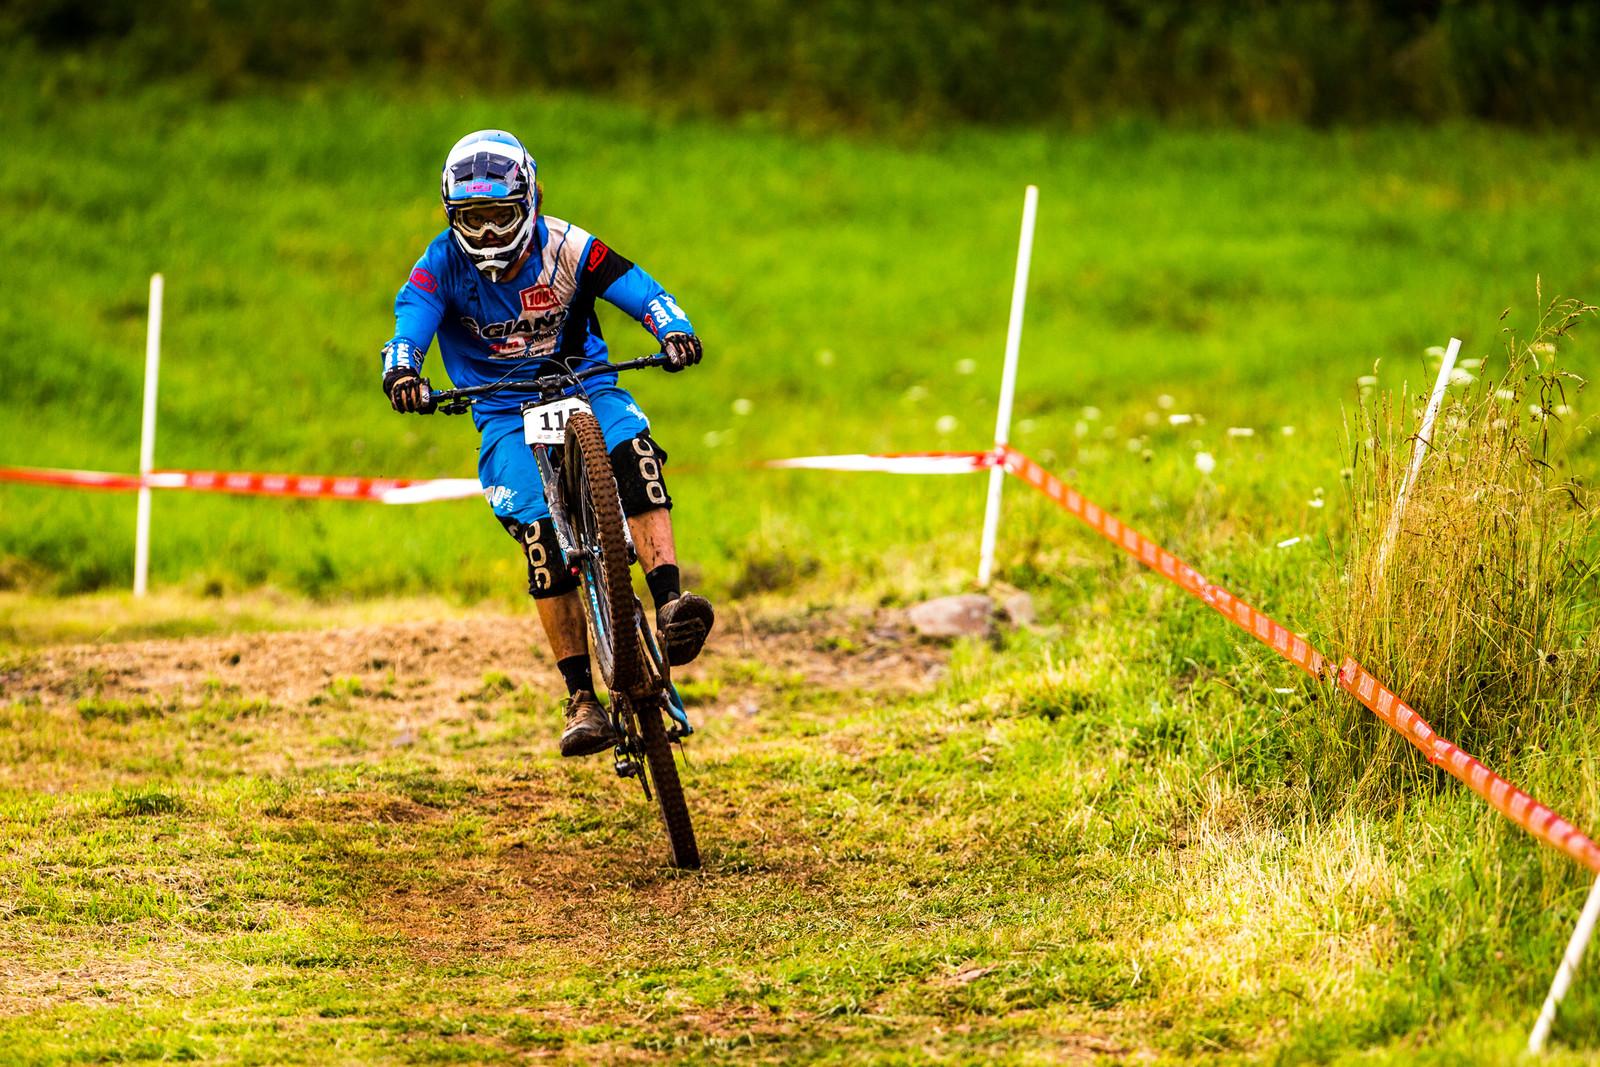 Damon Sedivy - RACE DAY GALLERY - 2017 Pro GRT, Windham, NY - Mountain Biking Pictures - Vital MTB